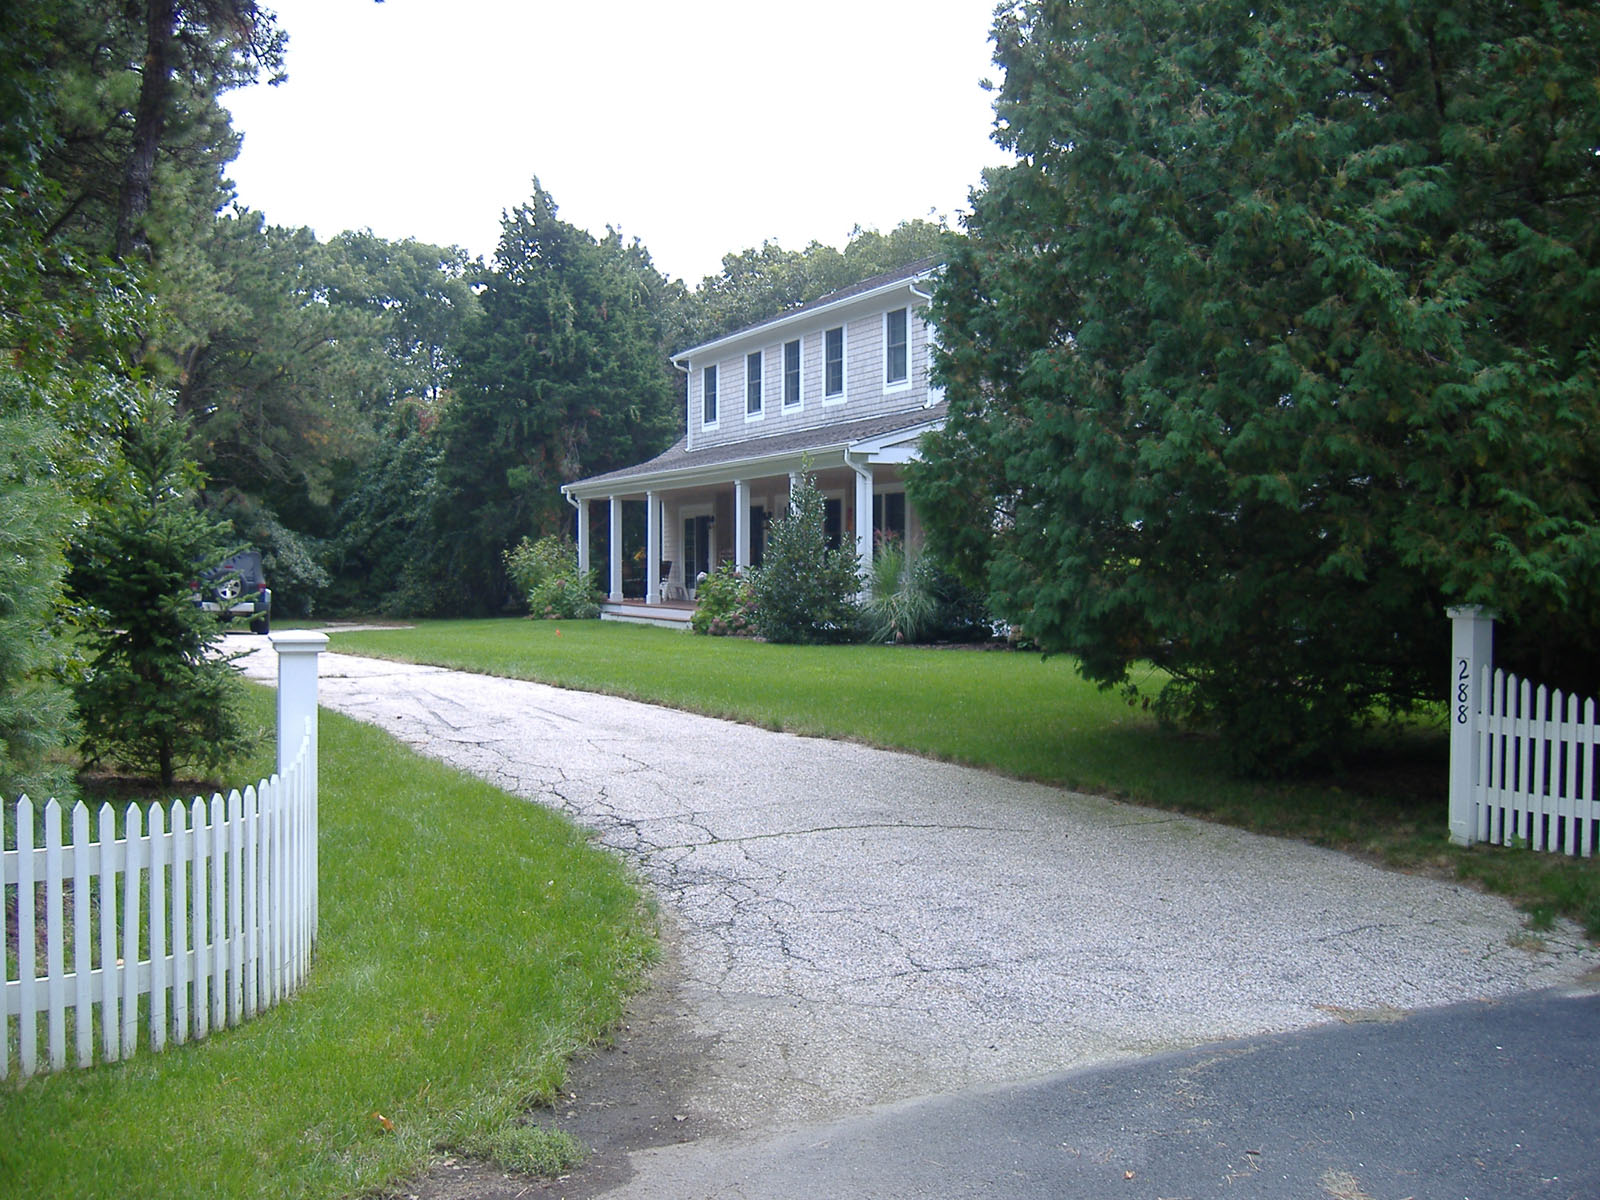 獨棟家庭住宅 為 出售 在 GREAT FAMILY HOME 288 Shore Drive New Seabury, 麻塞諸塞州, 02649 美國在/周邊: Mashpee